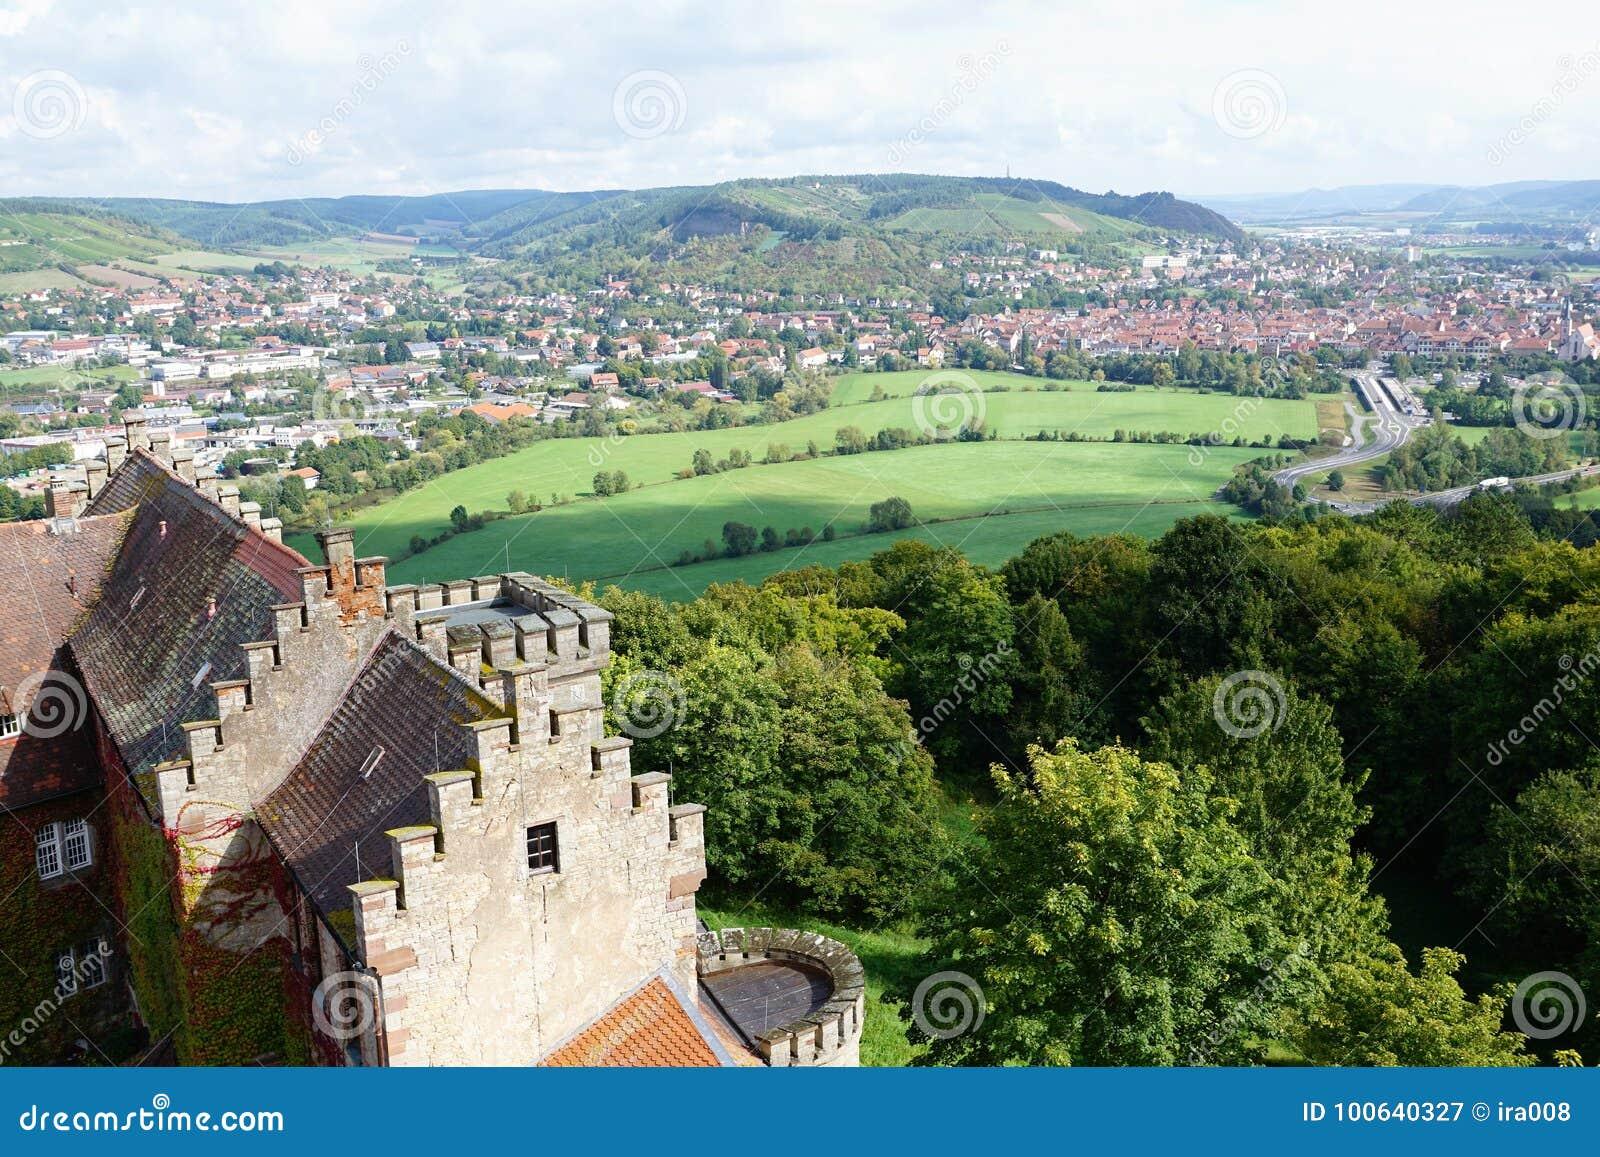 Castle In Hammelburg Stock Image Image Of Hiking Maria 100640327